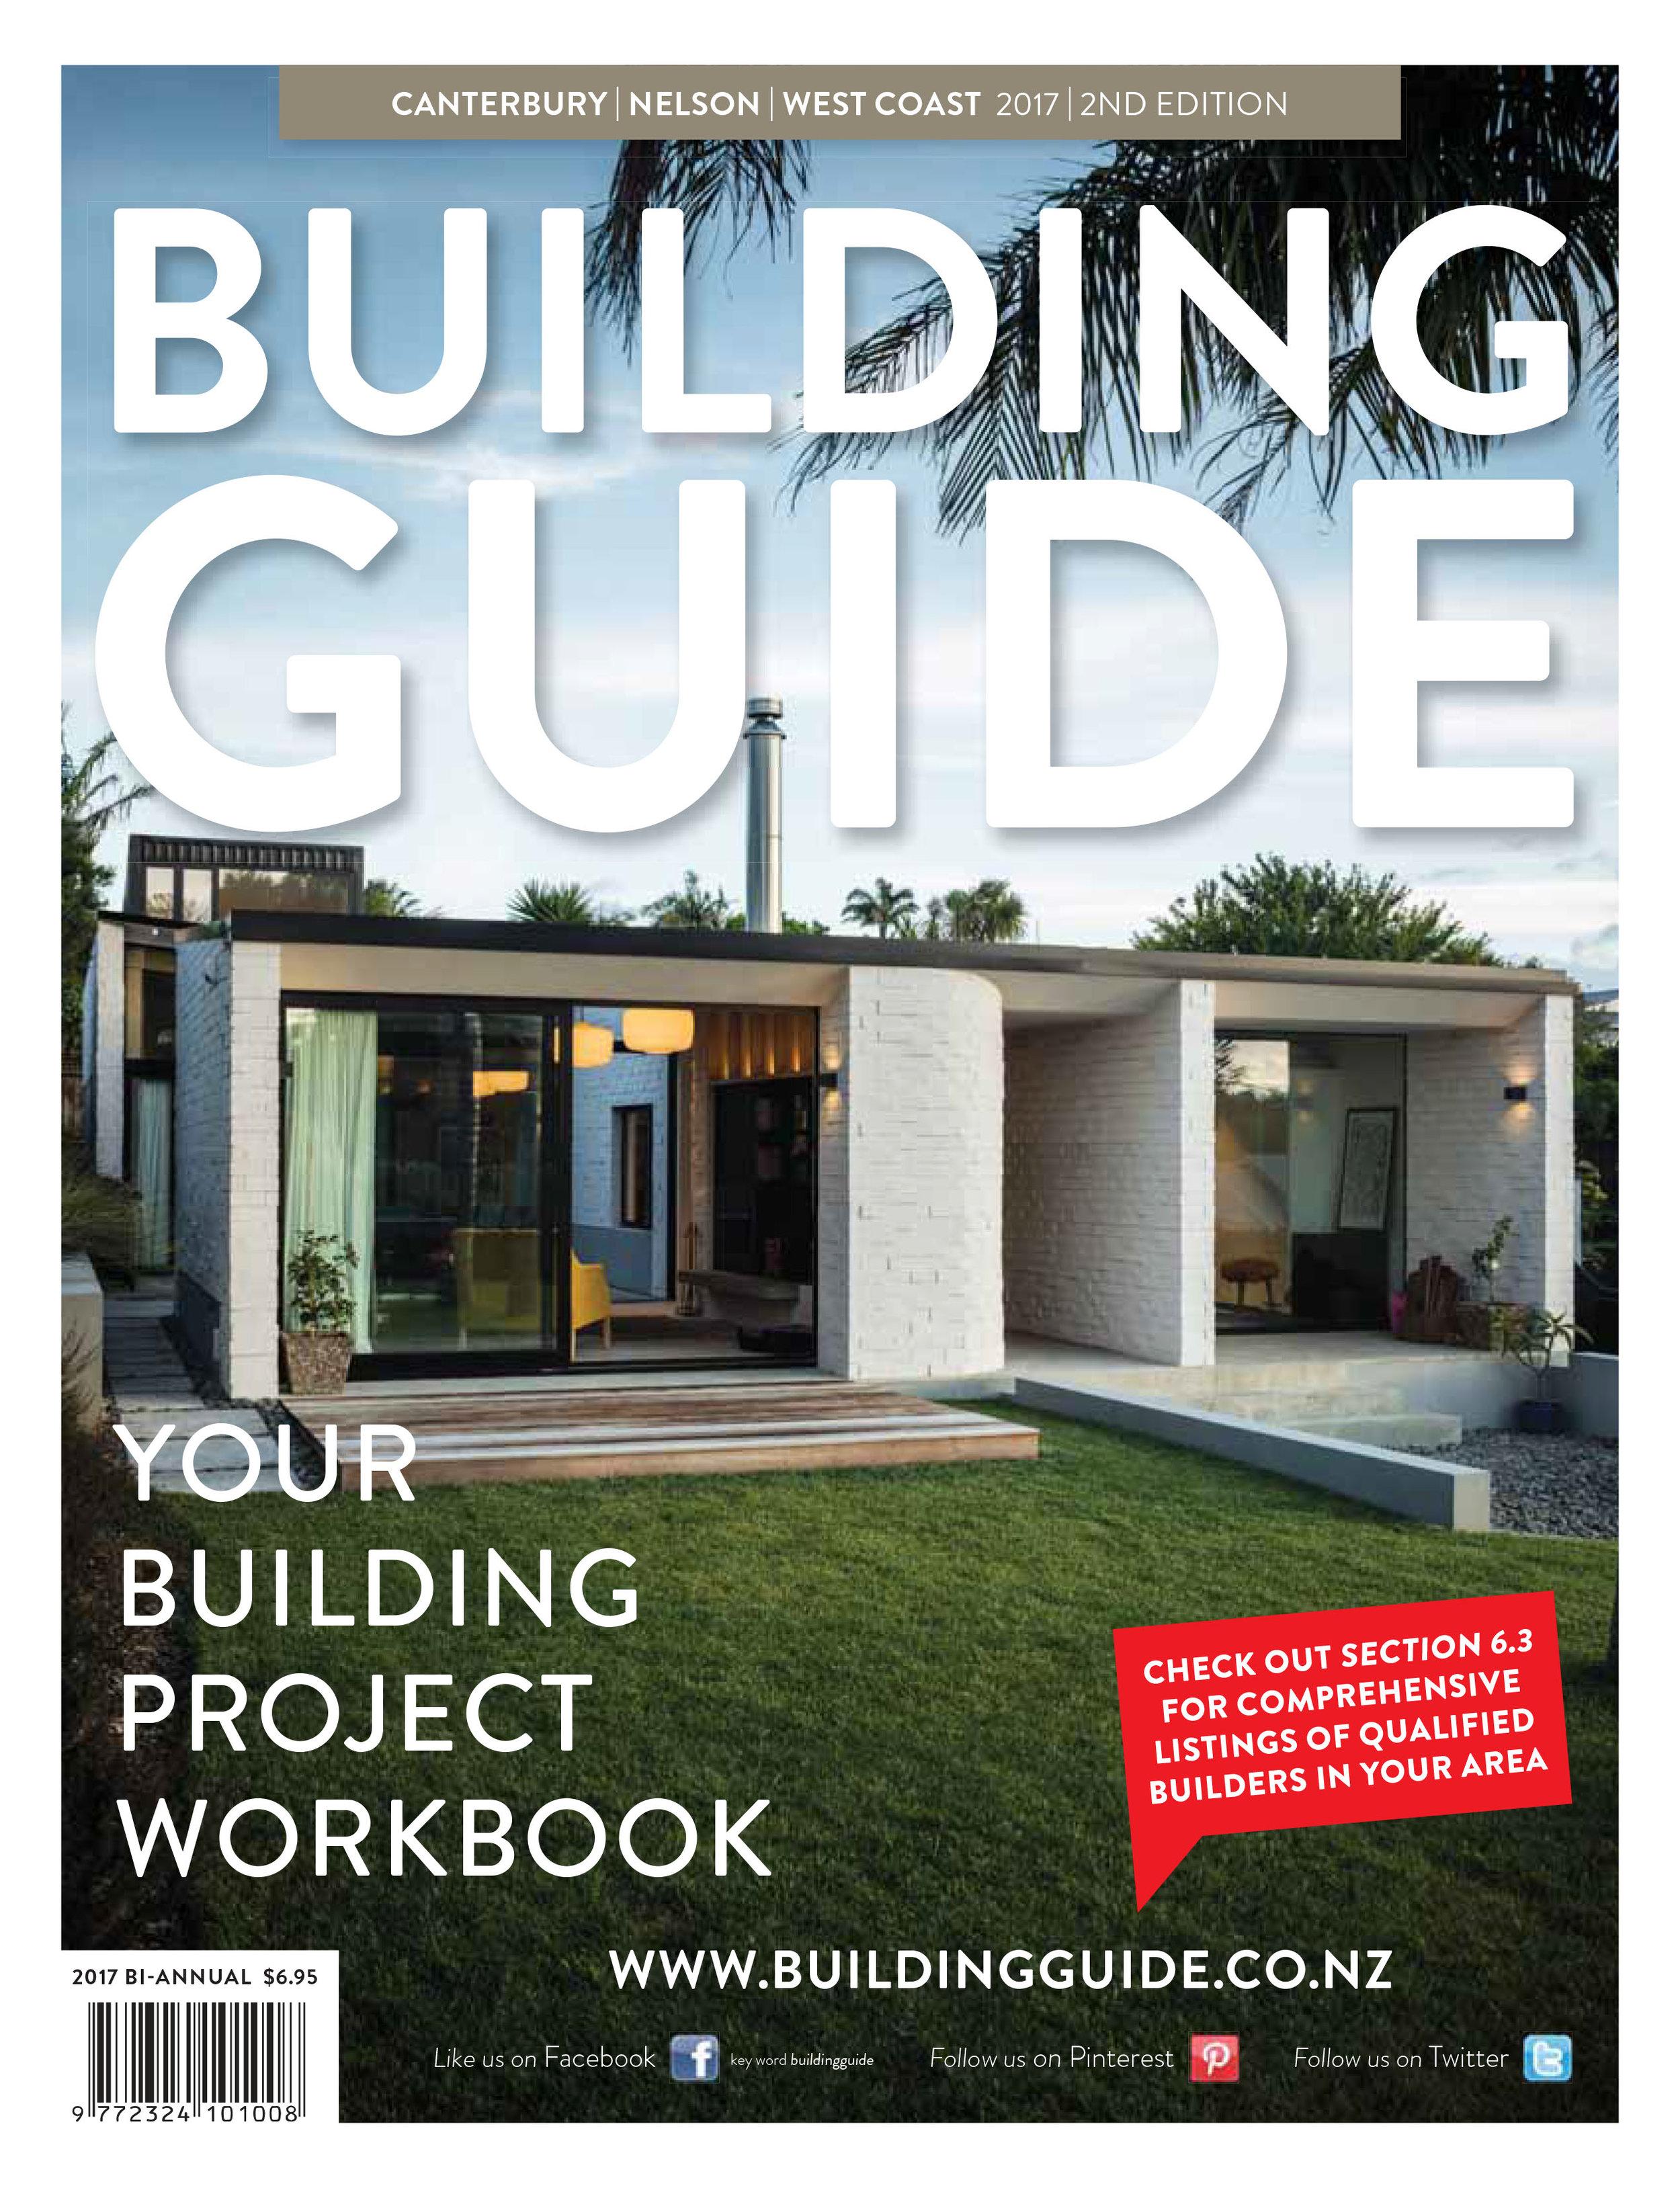 Canterbury-Nelson-West-Coast-Building-Guide2017-1.jpg